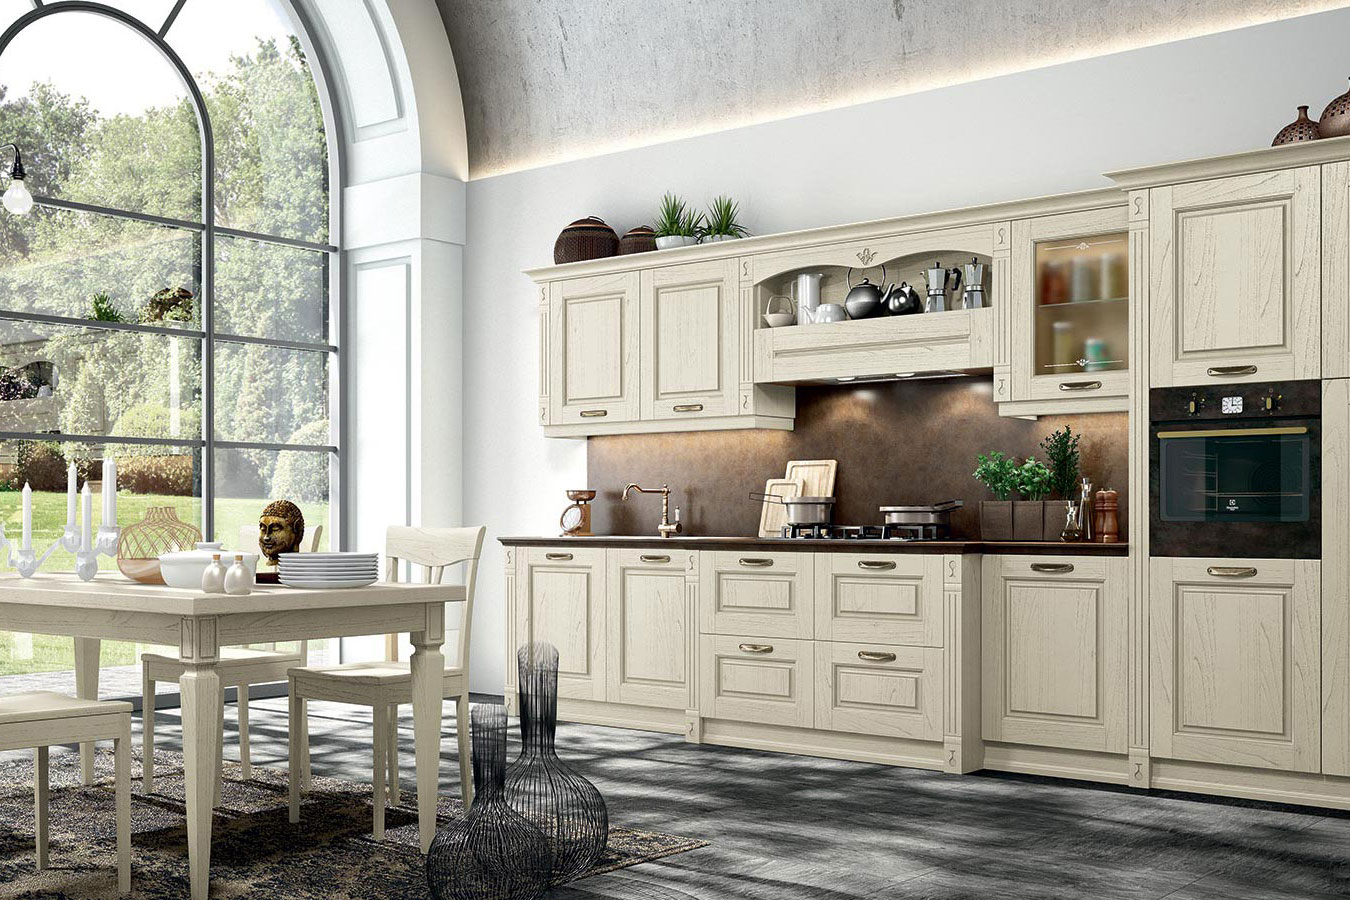 Offerte cucine verona free awesome mondo convenienza verona cucine gallery ideas design with - Cucine usate verona ...